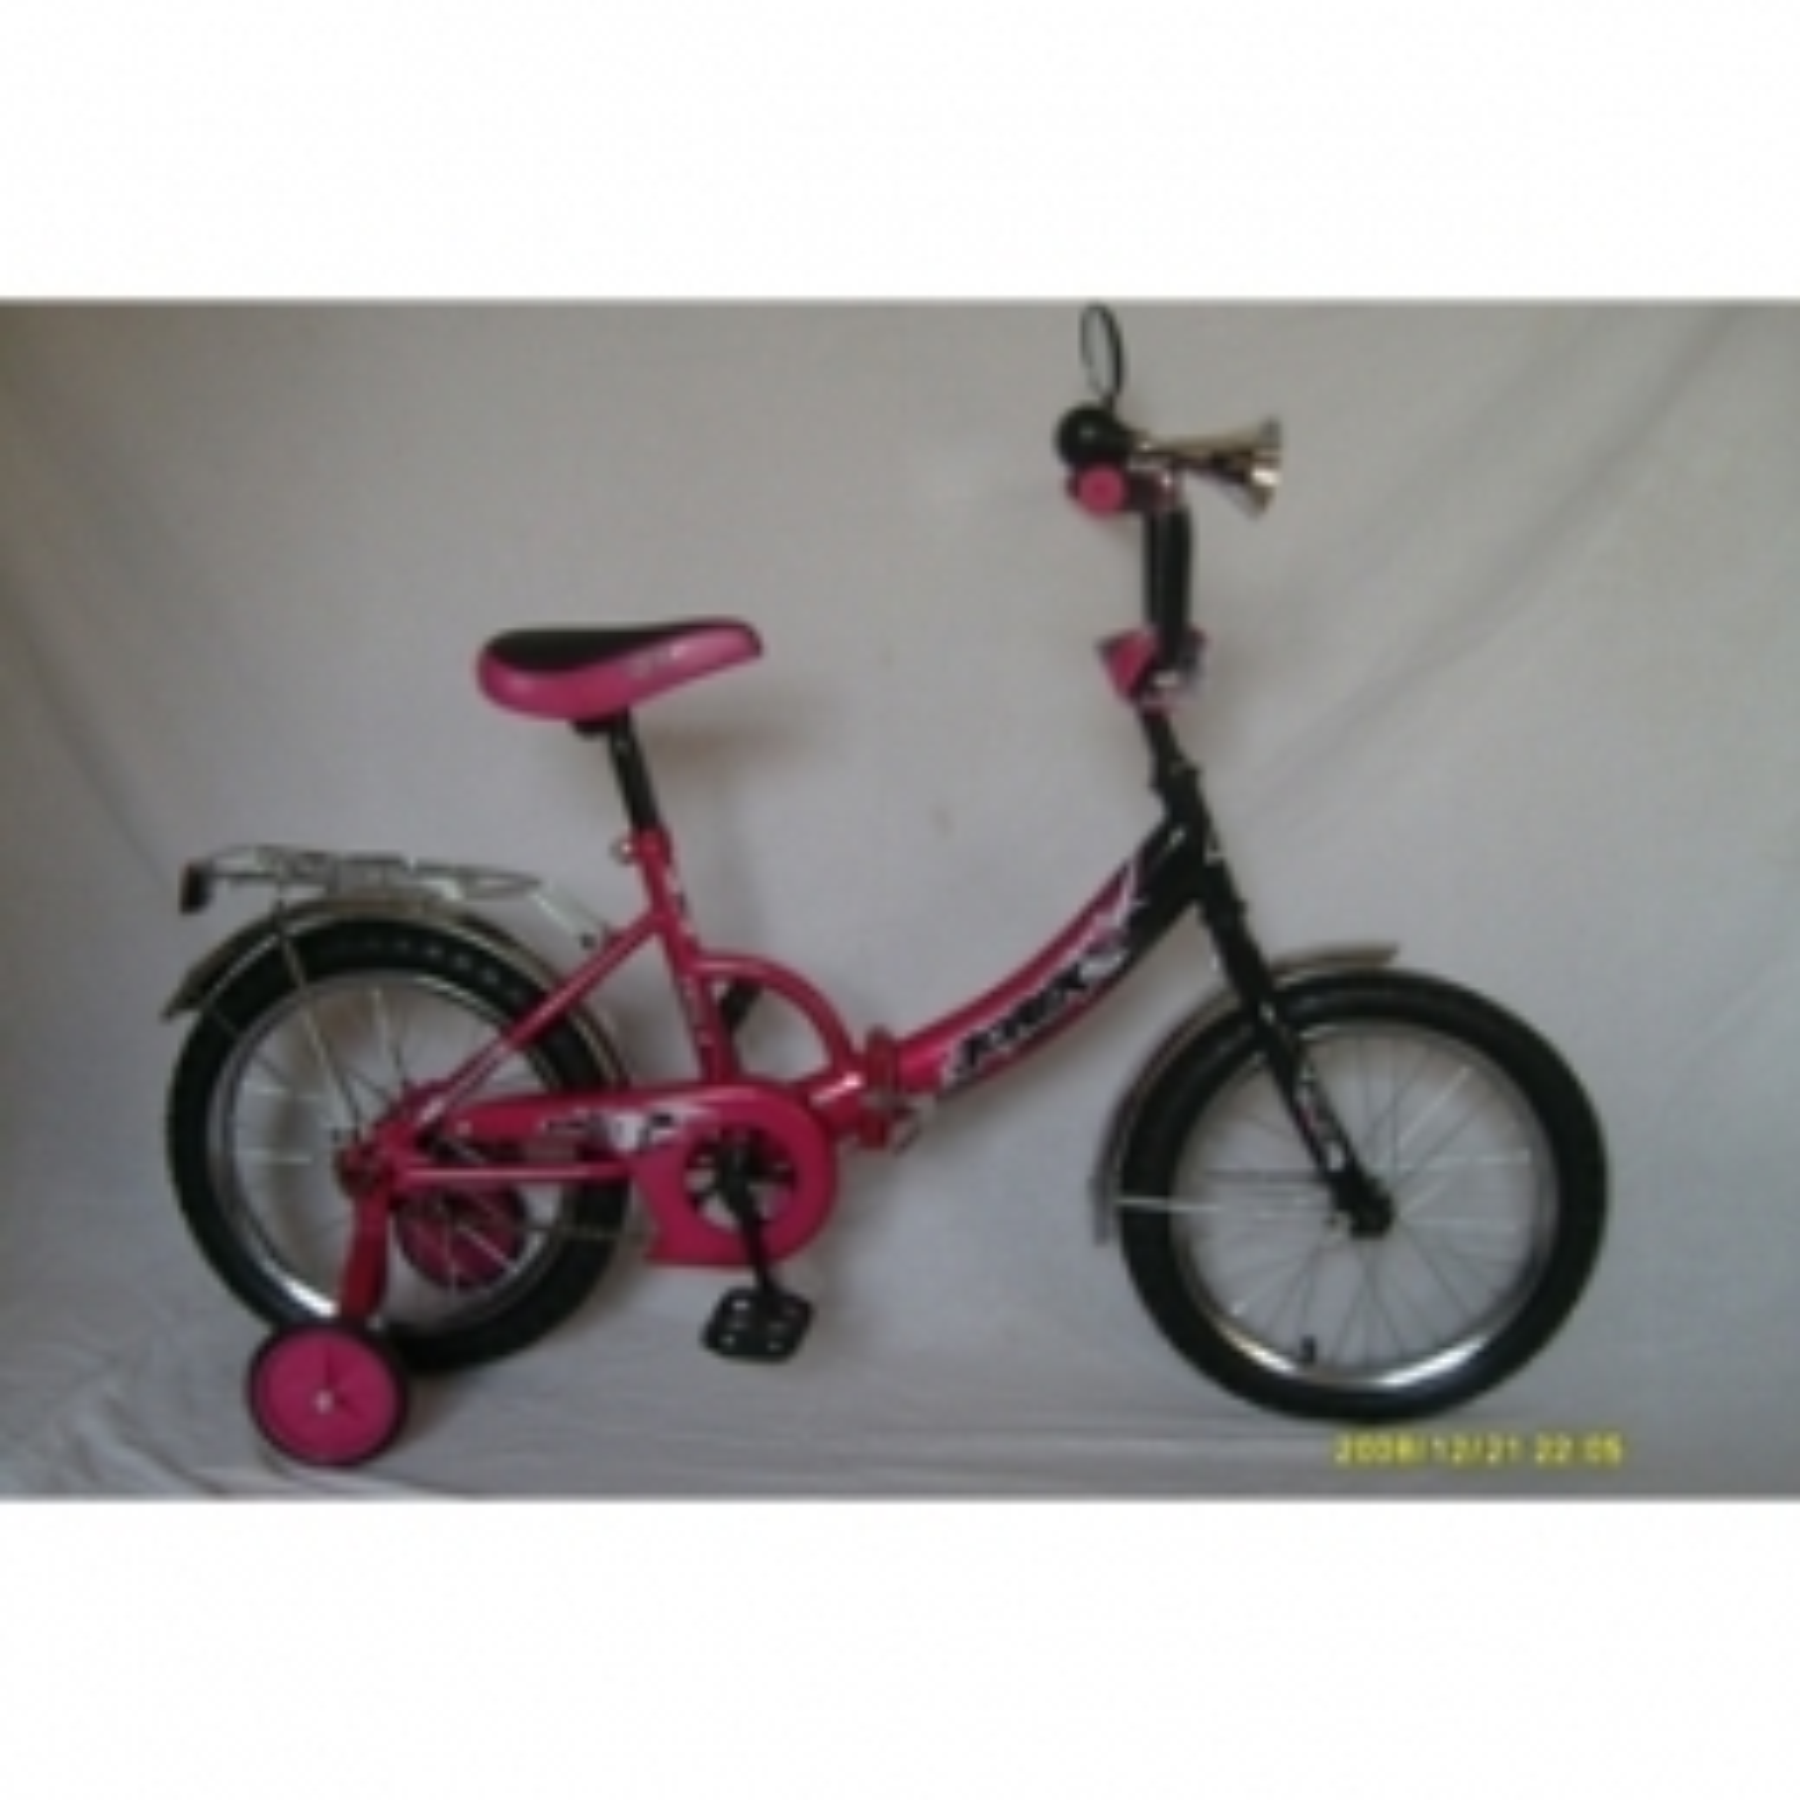 "Велосипед AIST 16"" Wiki фиолетовый"